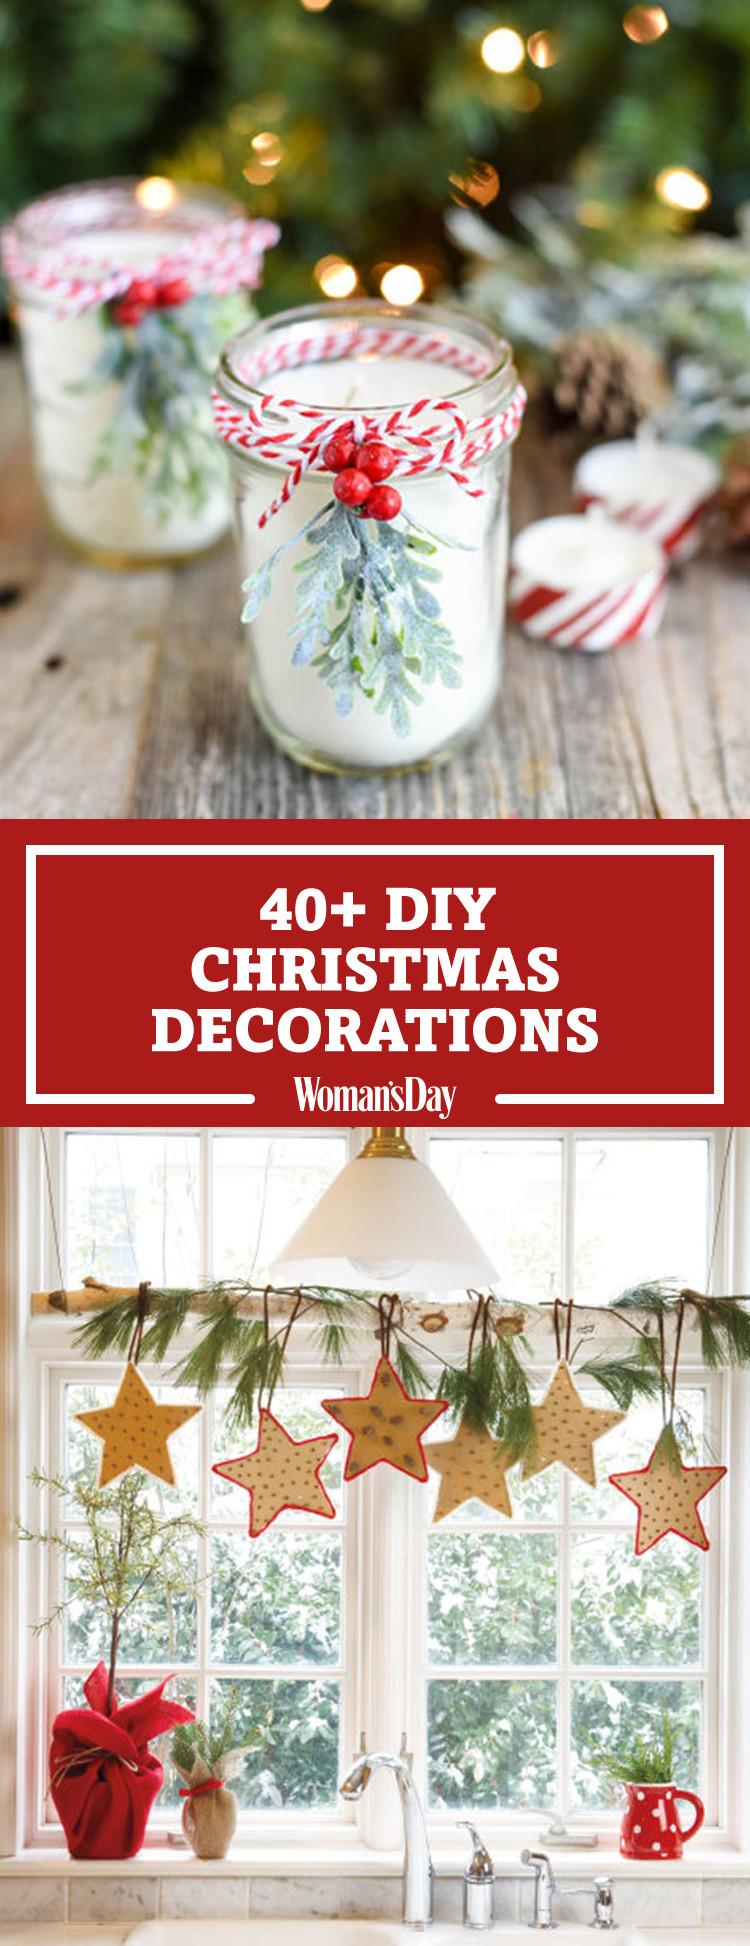 Christmas Decoration Ideas DIY  47 Easy DIY Christmas Decorations Homemade Ideas for